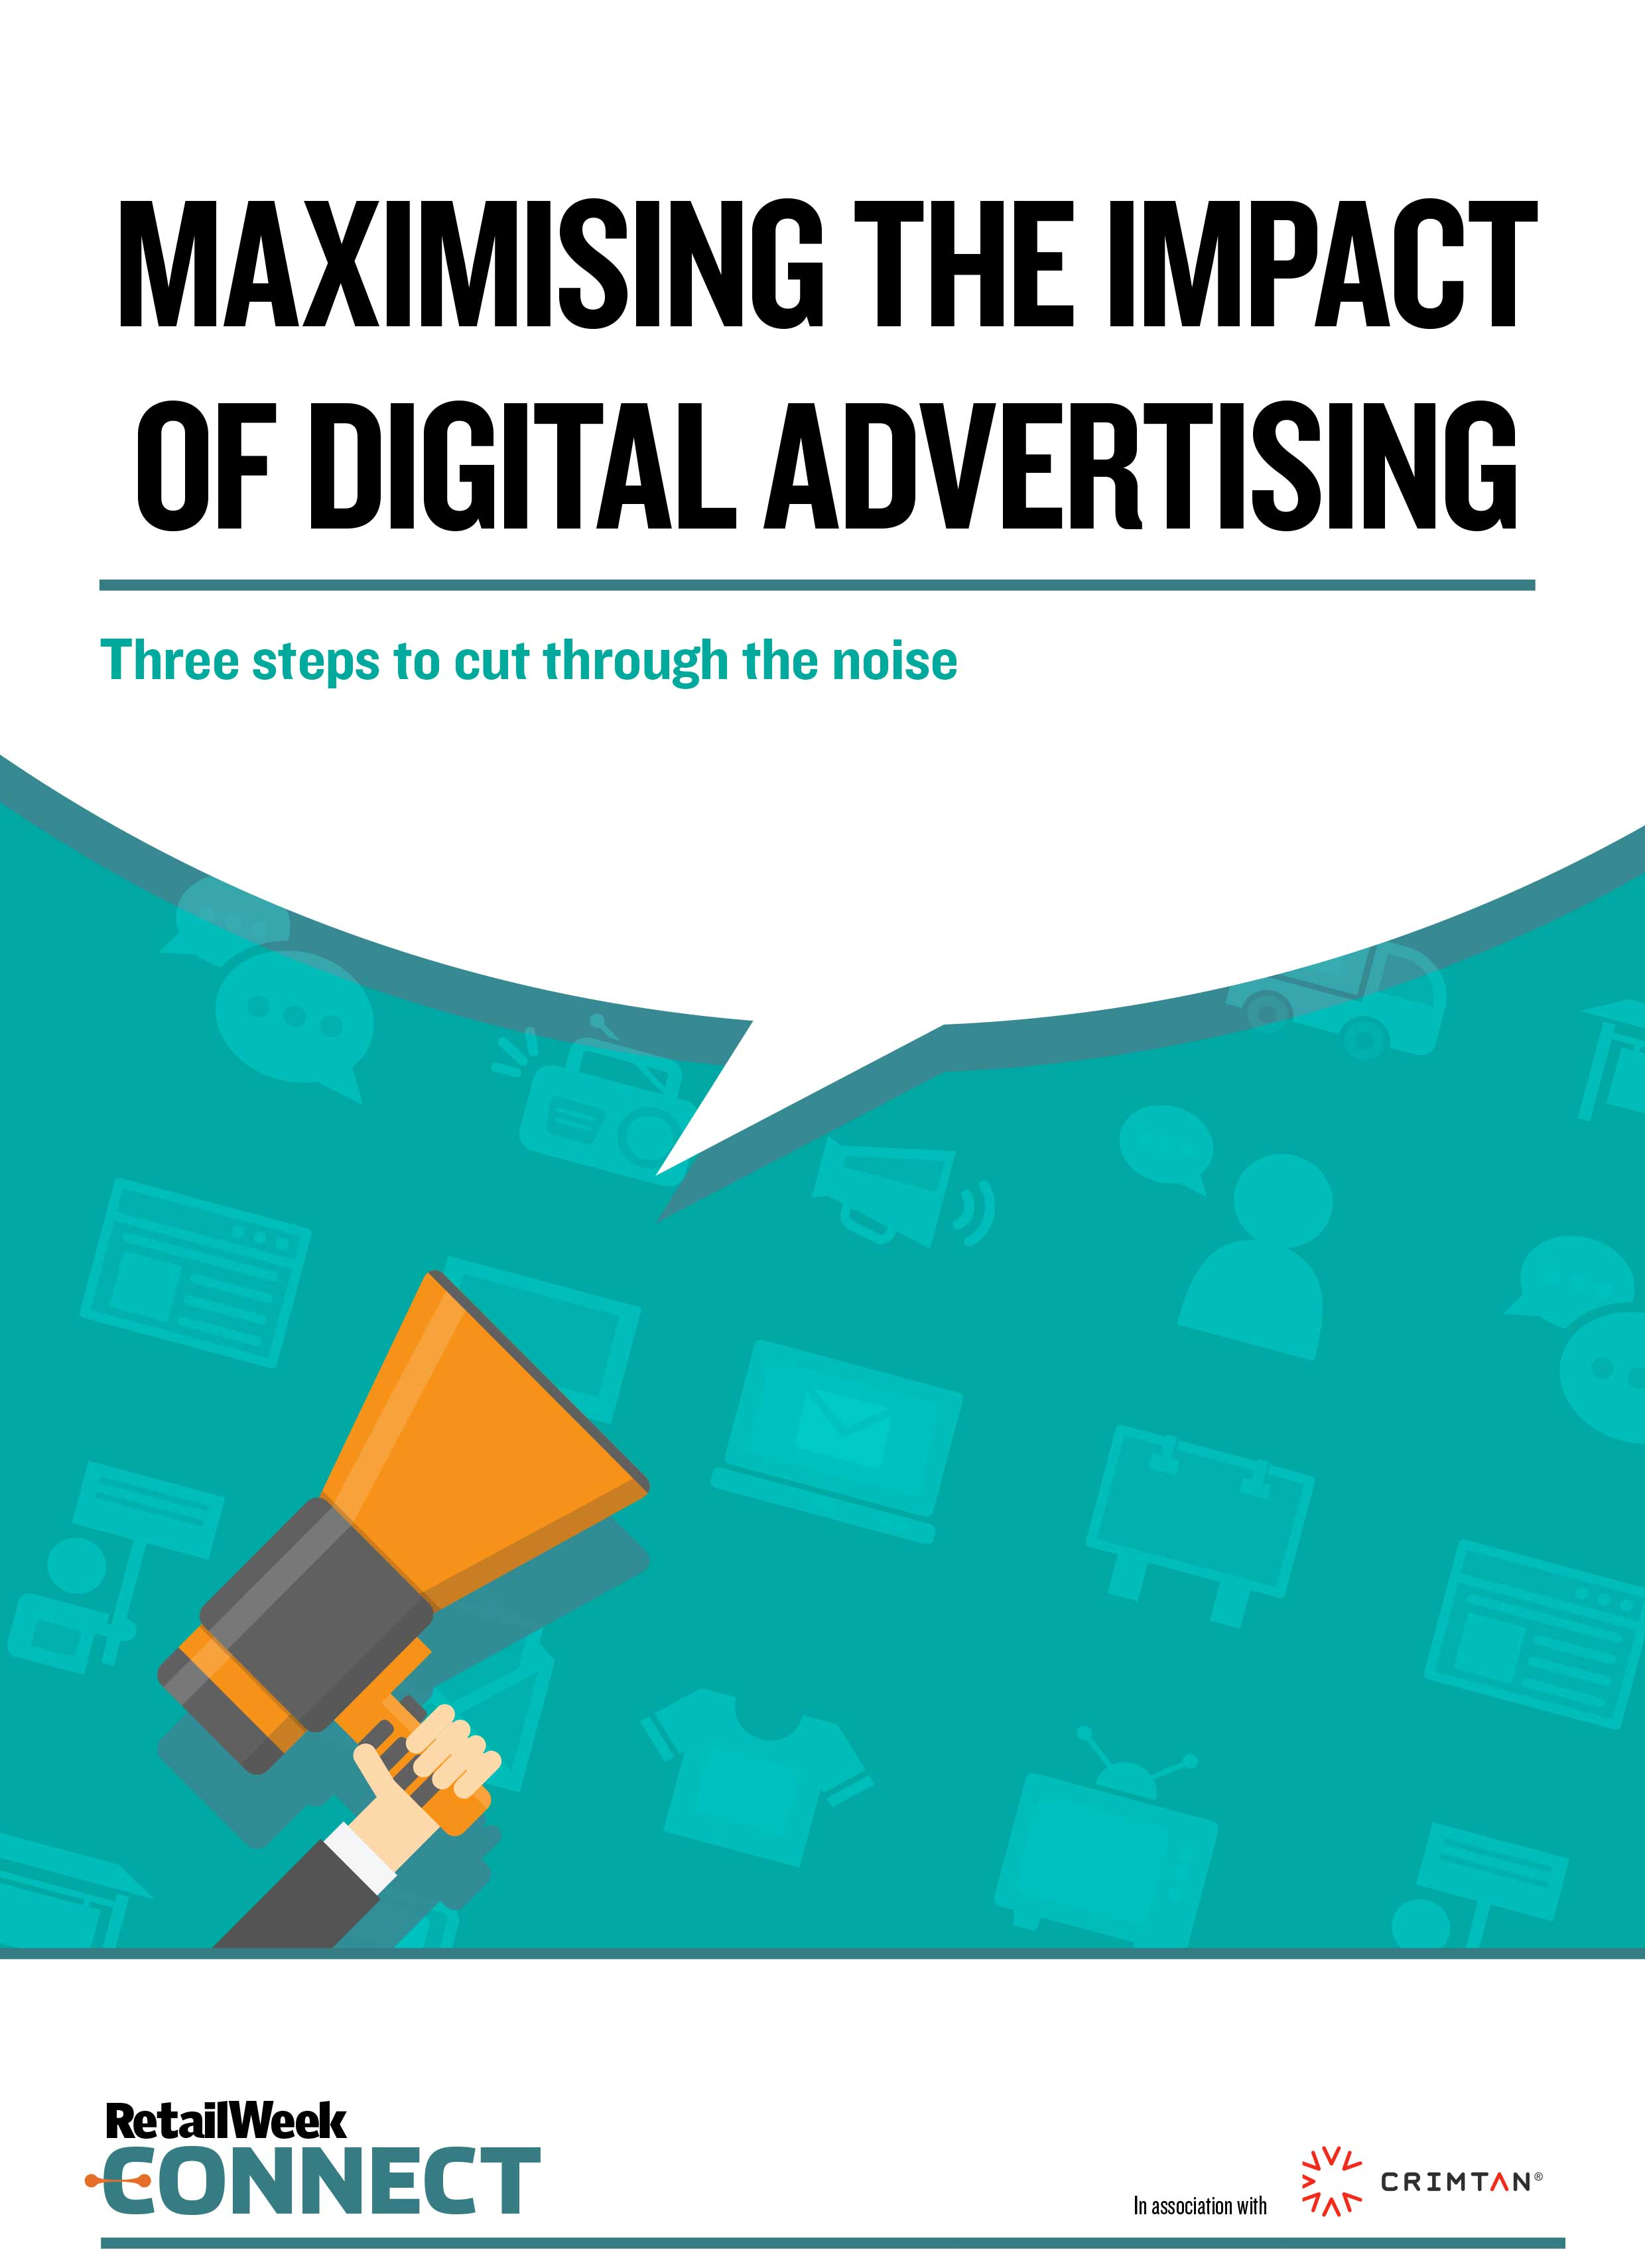 Crimtan Digital advertising